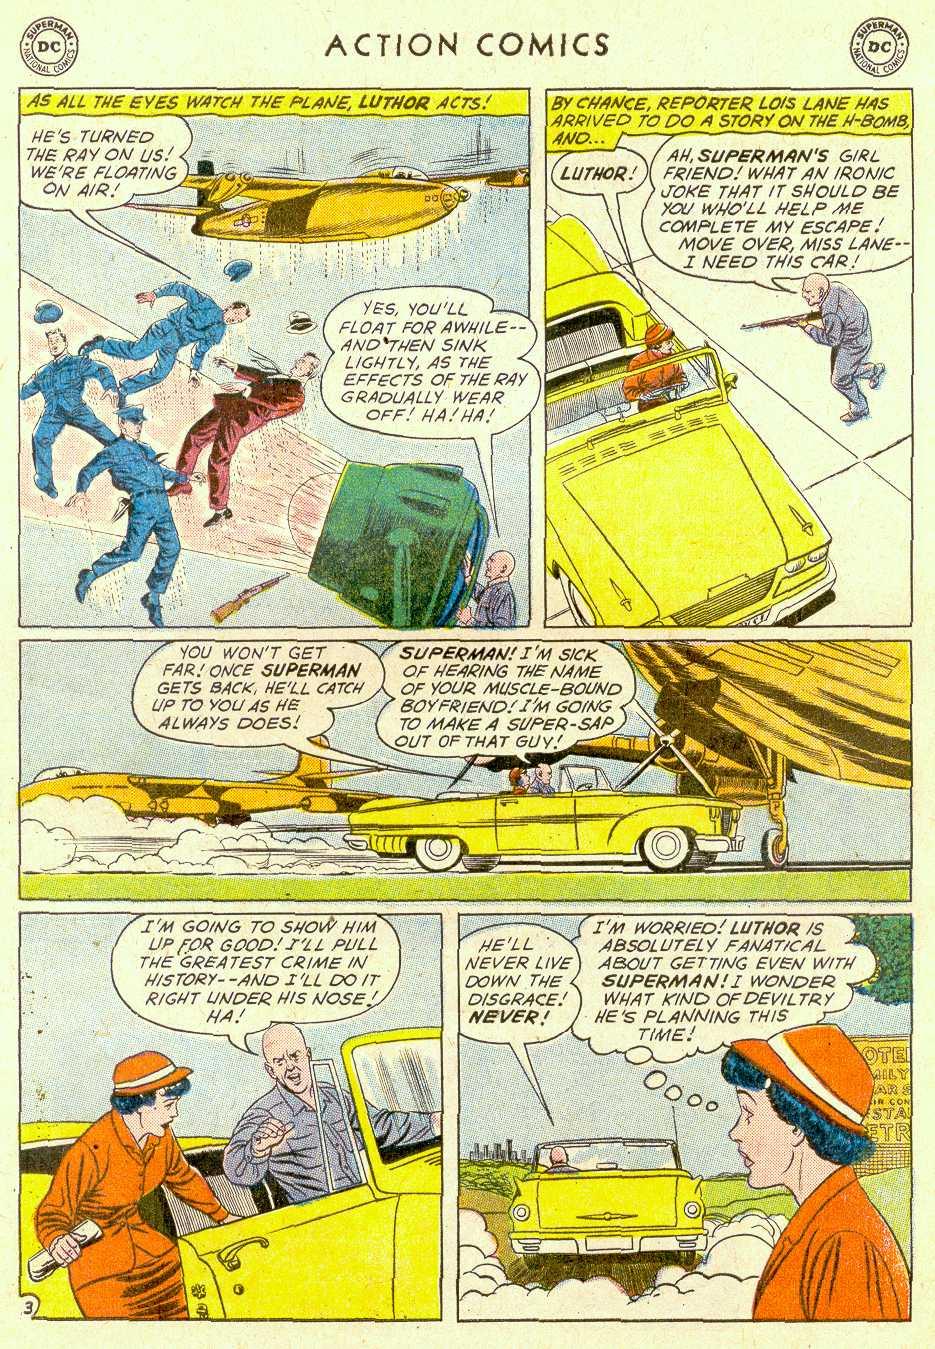 Action Comics (1938) 277 Page 4